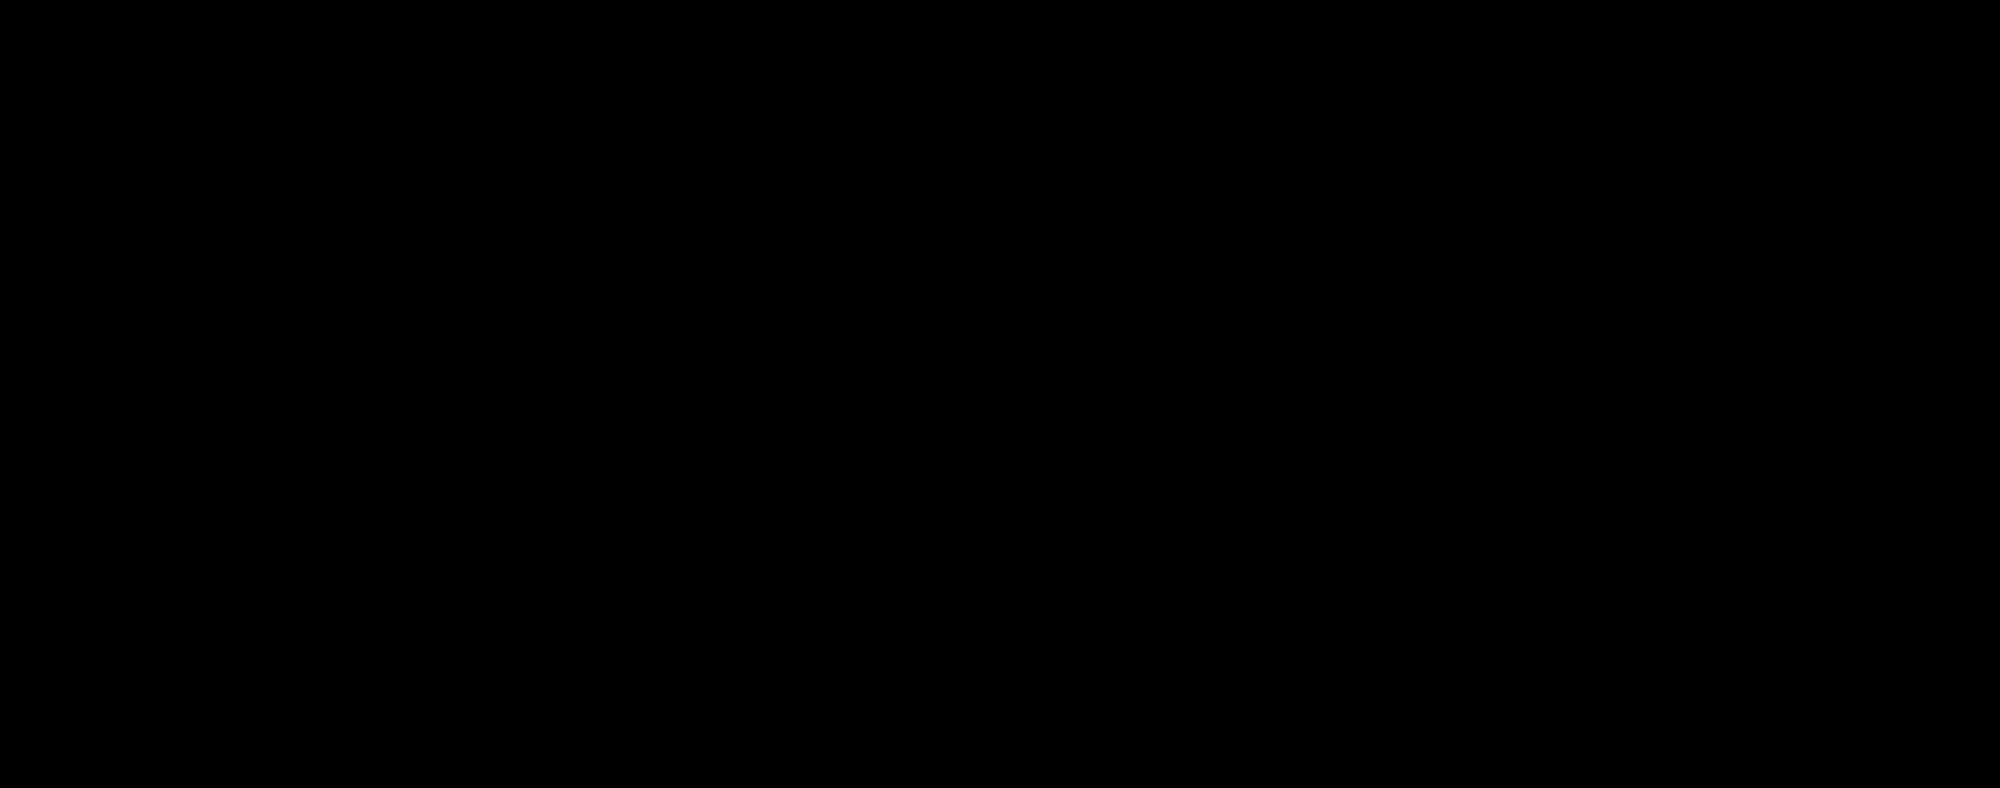 Hockey Coach Share-logo-black.png